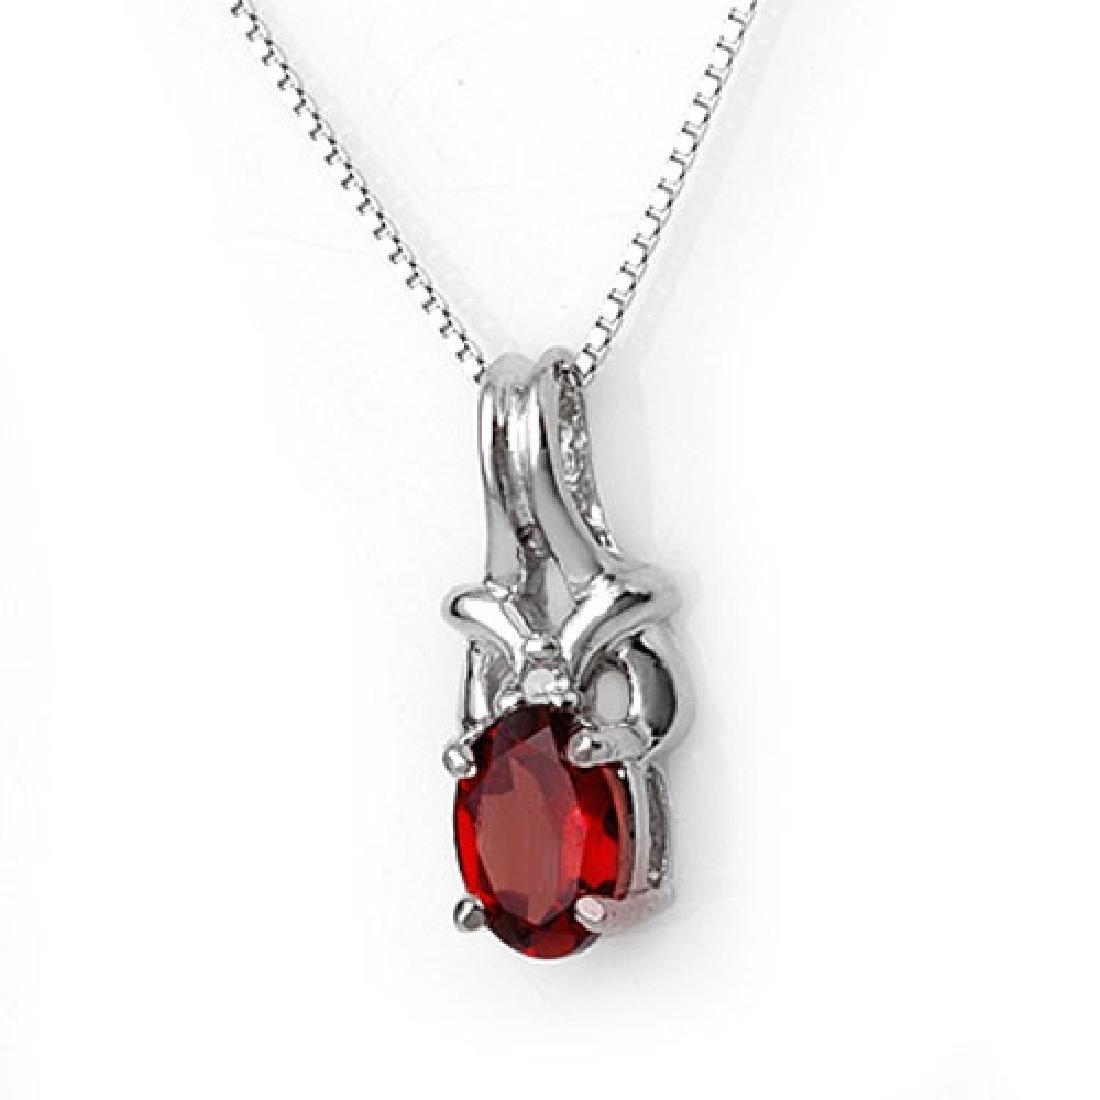 1.0 CTW Garnet & Diamond Necklace 10K White Gold